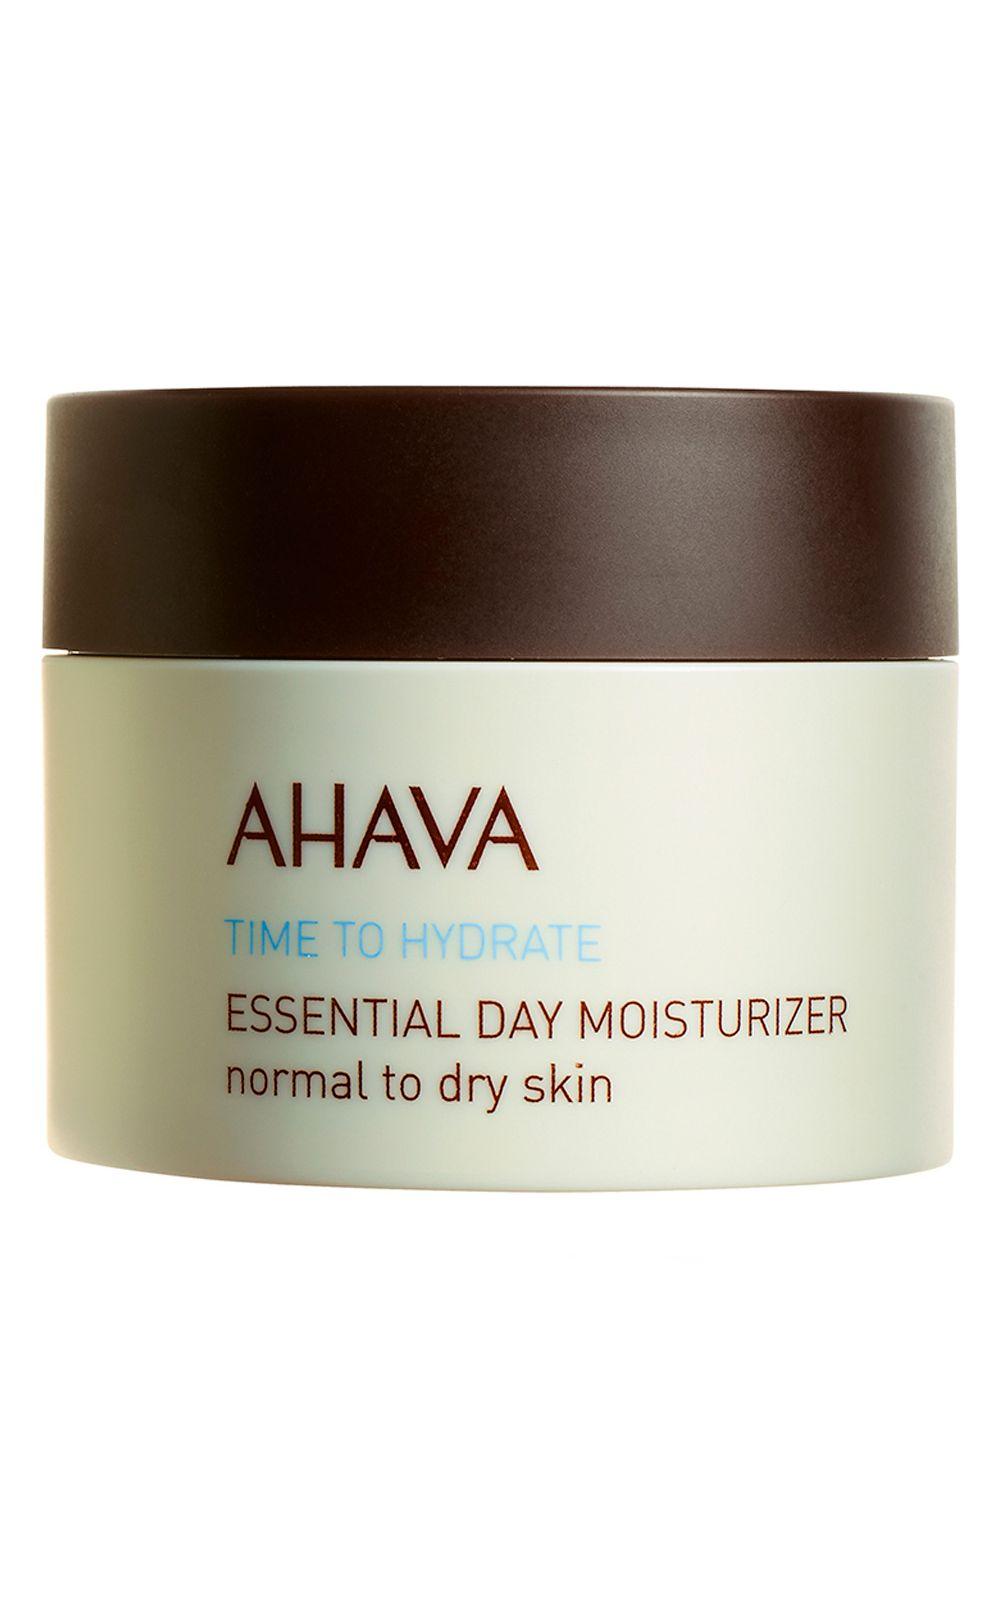 Foto 1 - Hidratante Facial Ahava - Essential Day Moisturizer For Normal to Dry Skin - 50ml